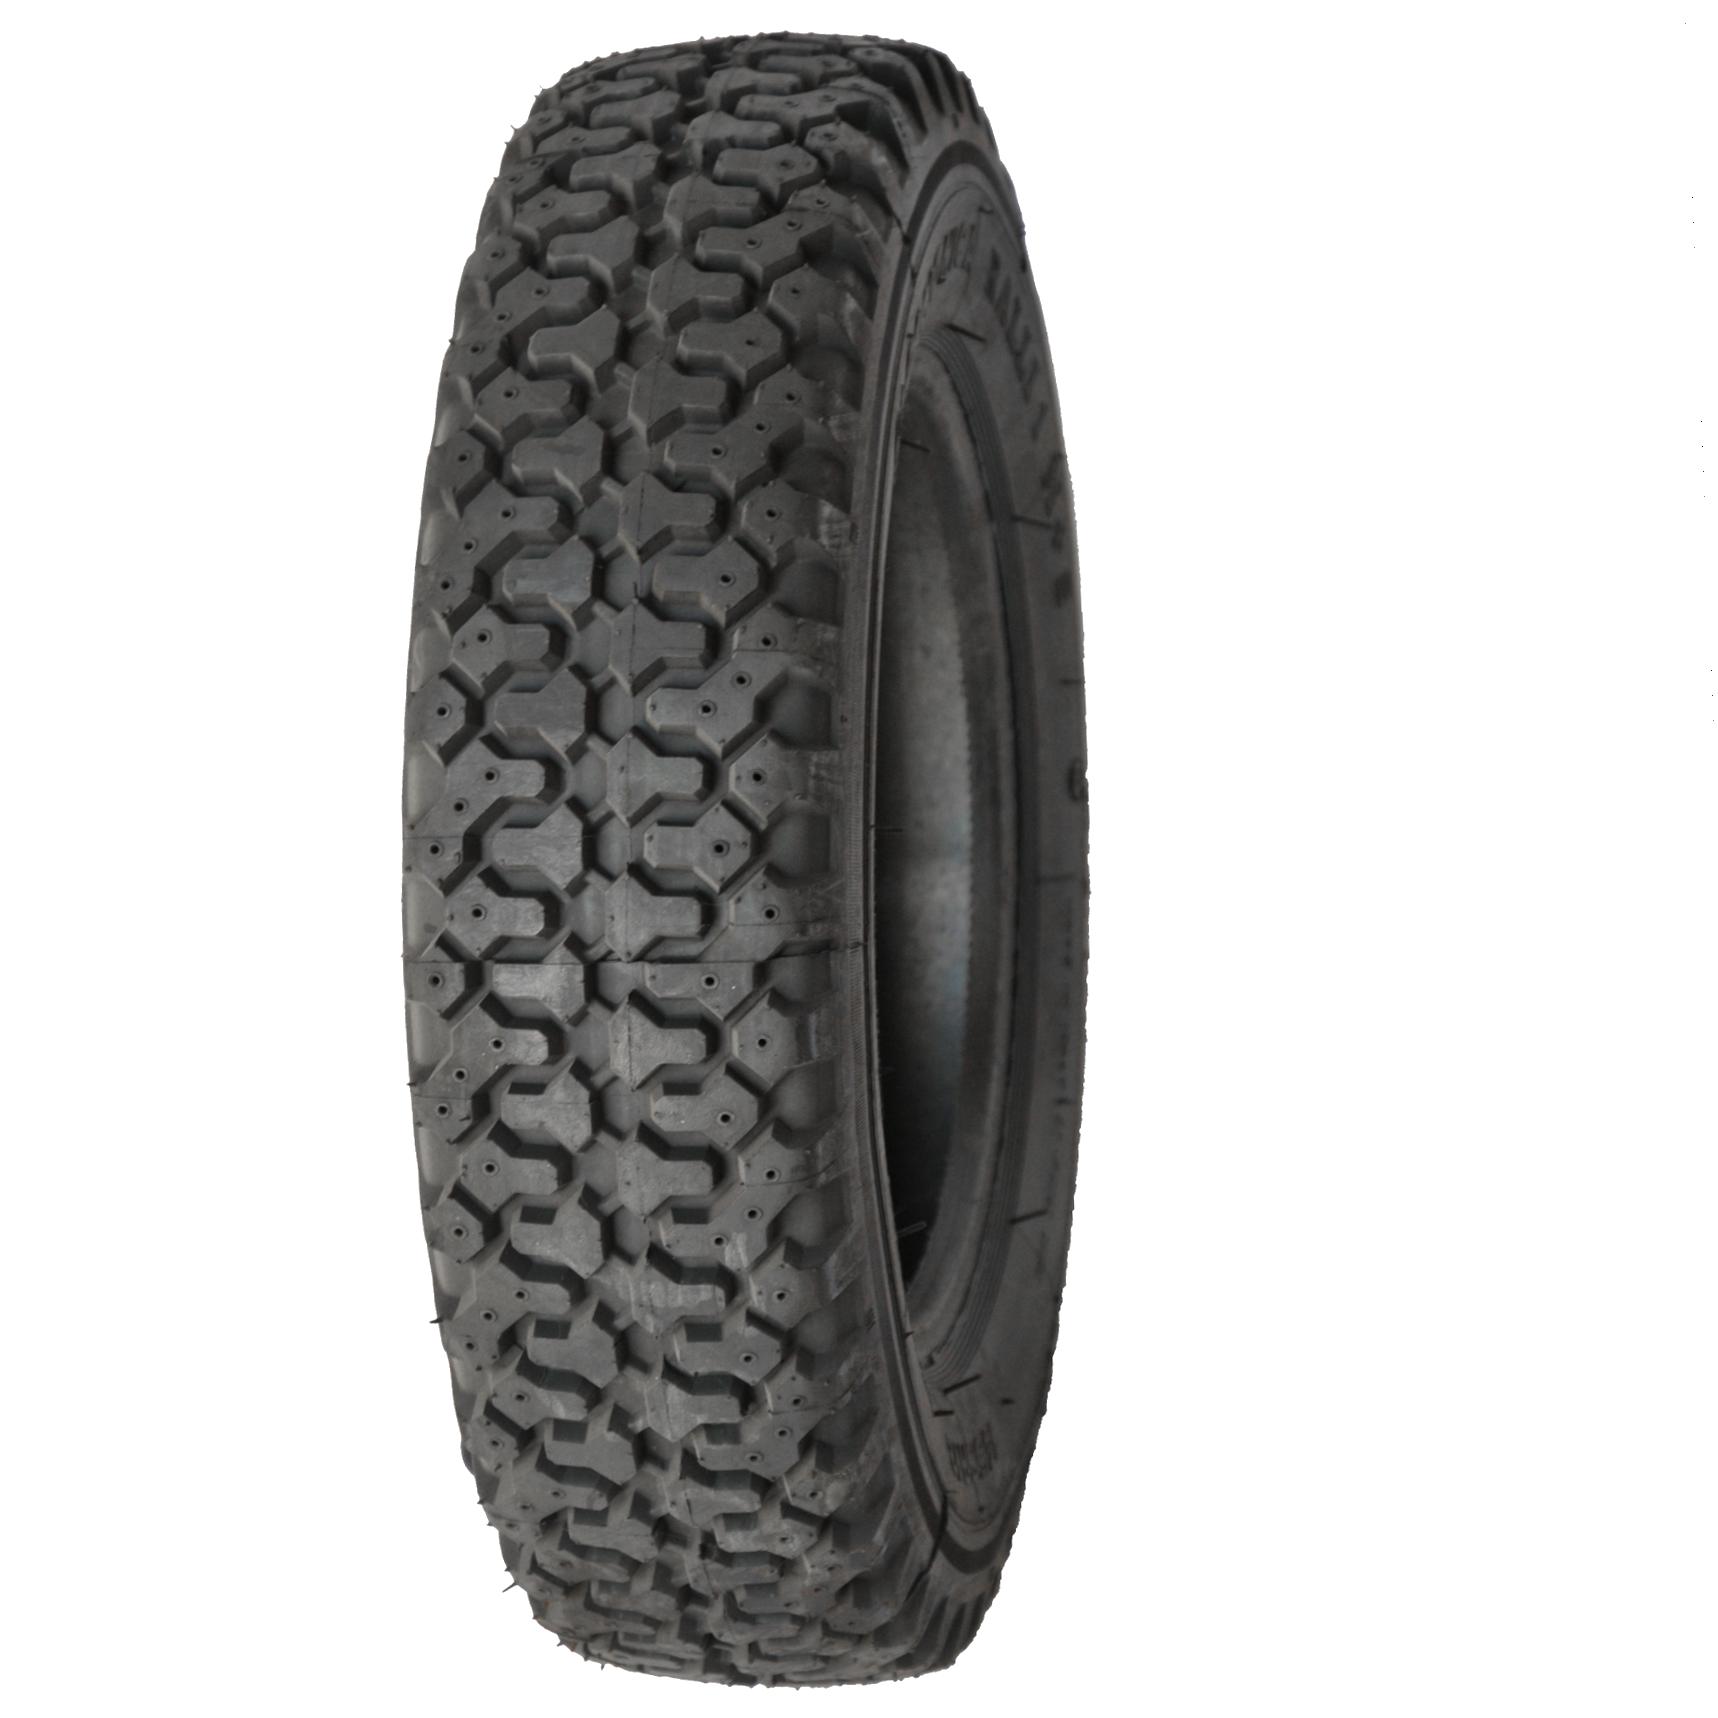 Bfg Ko 2 >> Off-road tire Rally 1 135/80 R13 Italian company Pneus Ovada